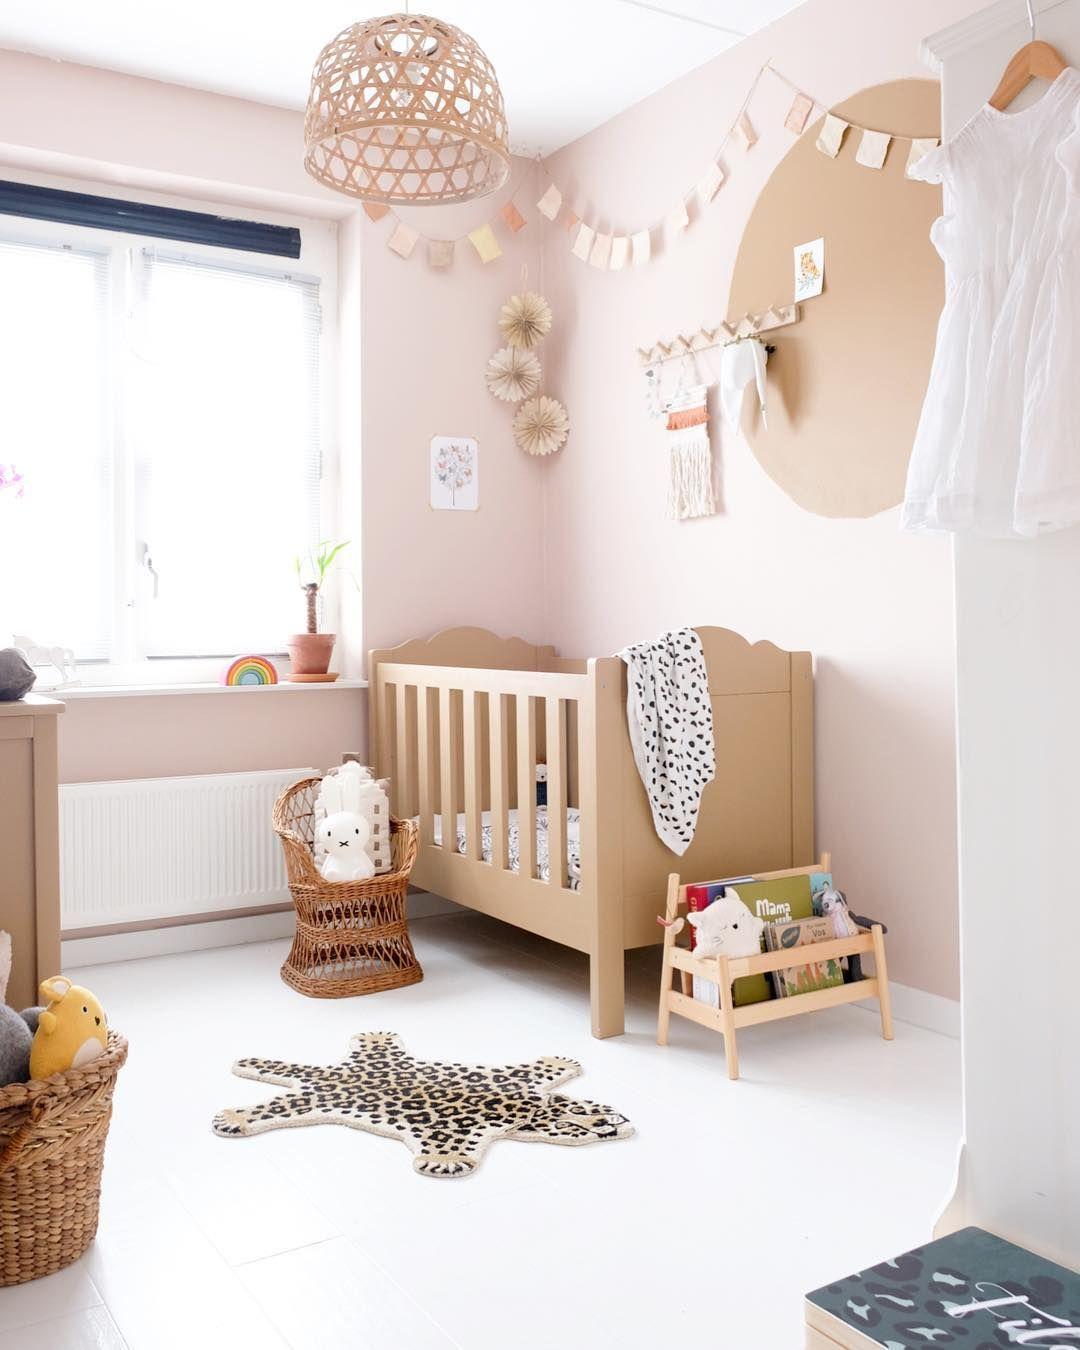 kinderkamer c Mirjam Hart kinderslaapkamer kidsbedroom